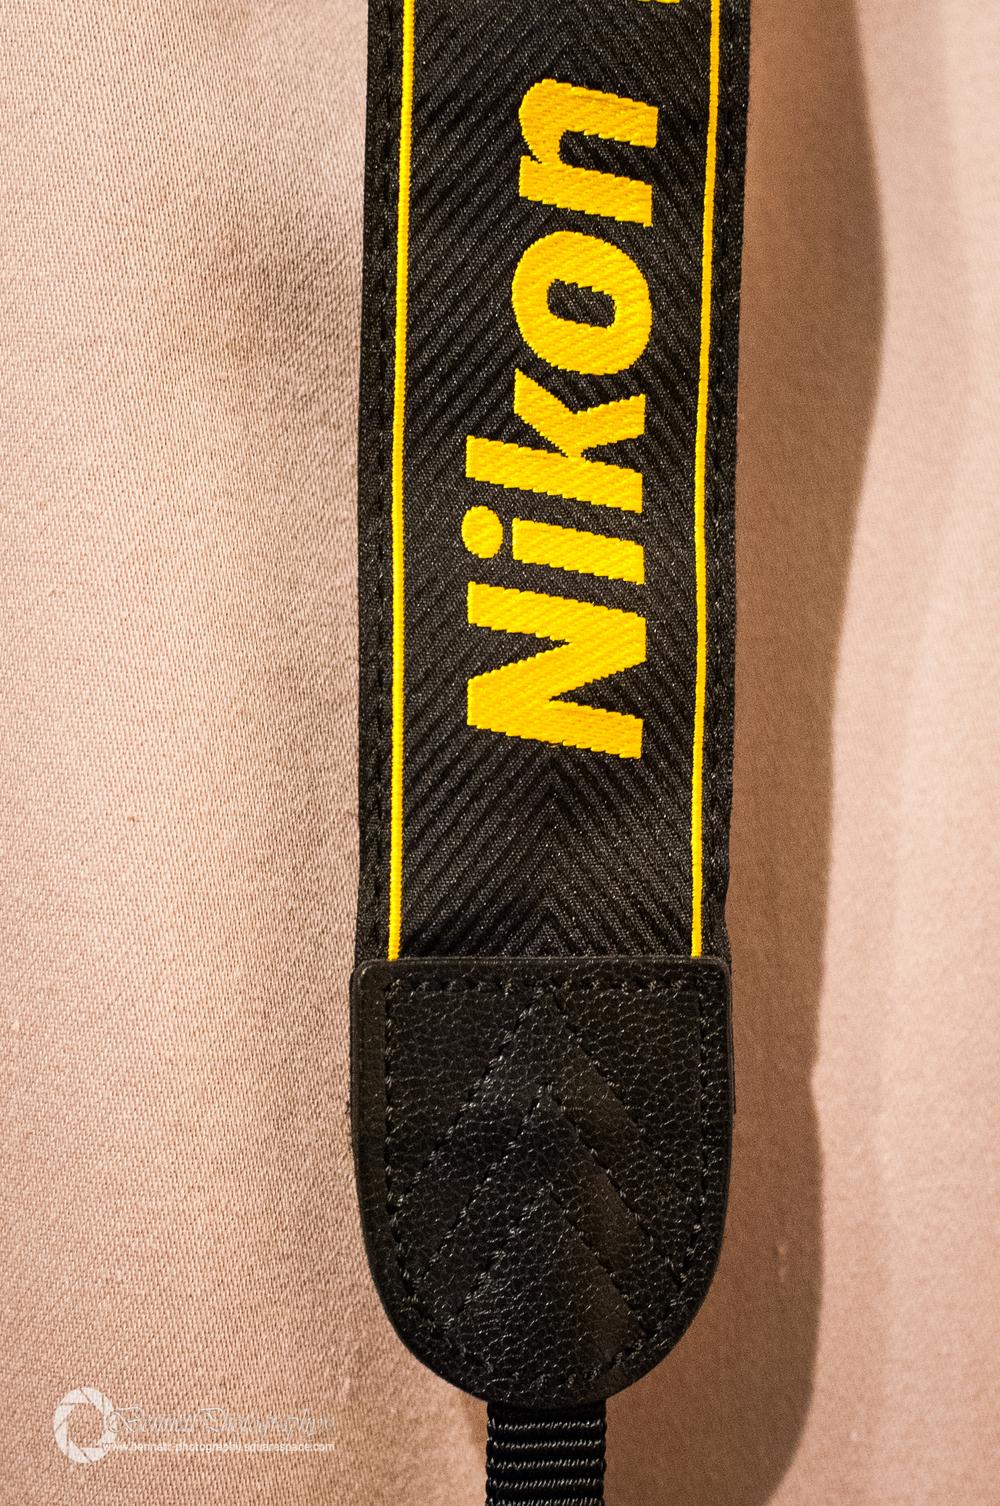 Nikon 50m 1.8G